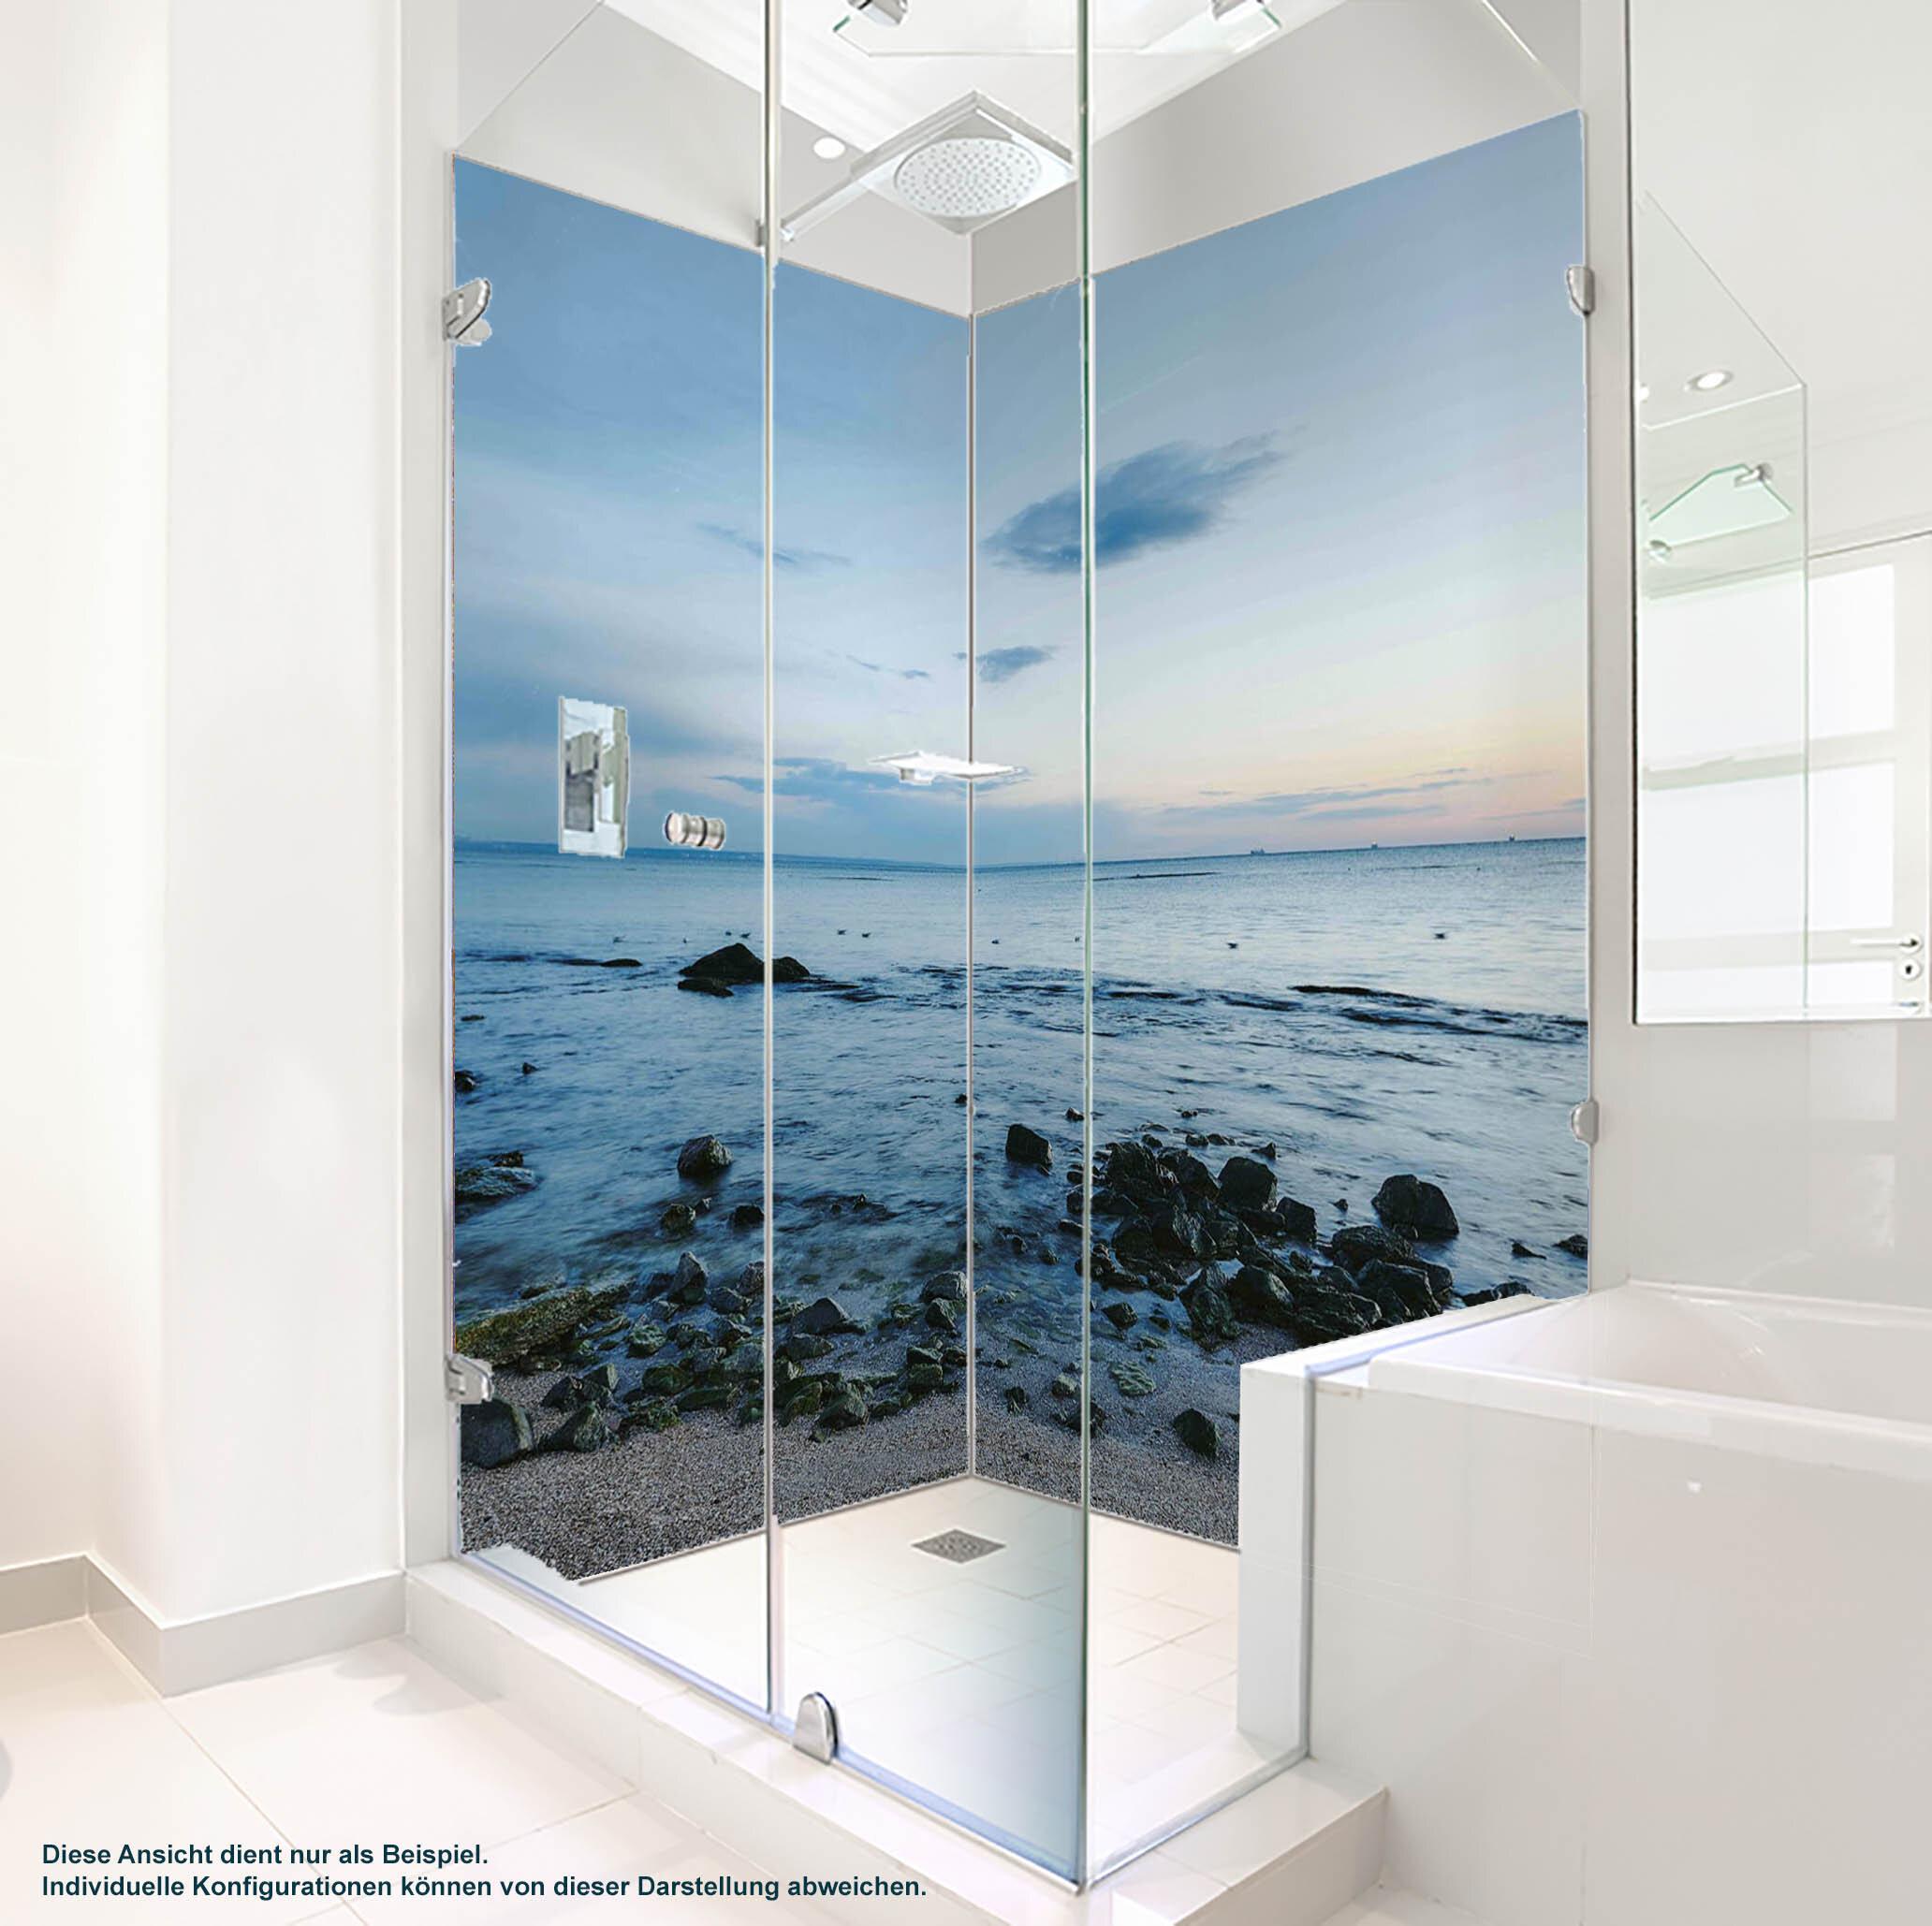 Dusche PlateART Duschrückwand mit Motiv Strand und Meer Kiesstrand